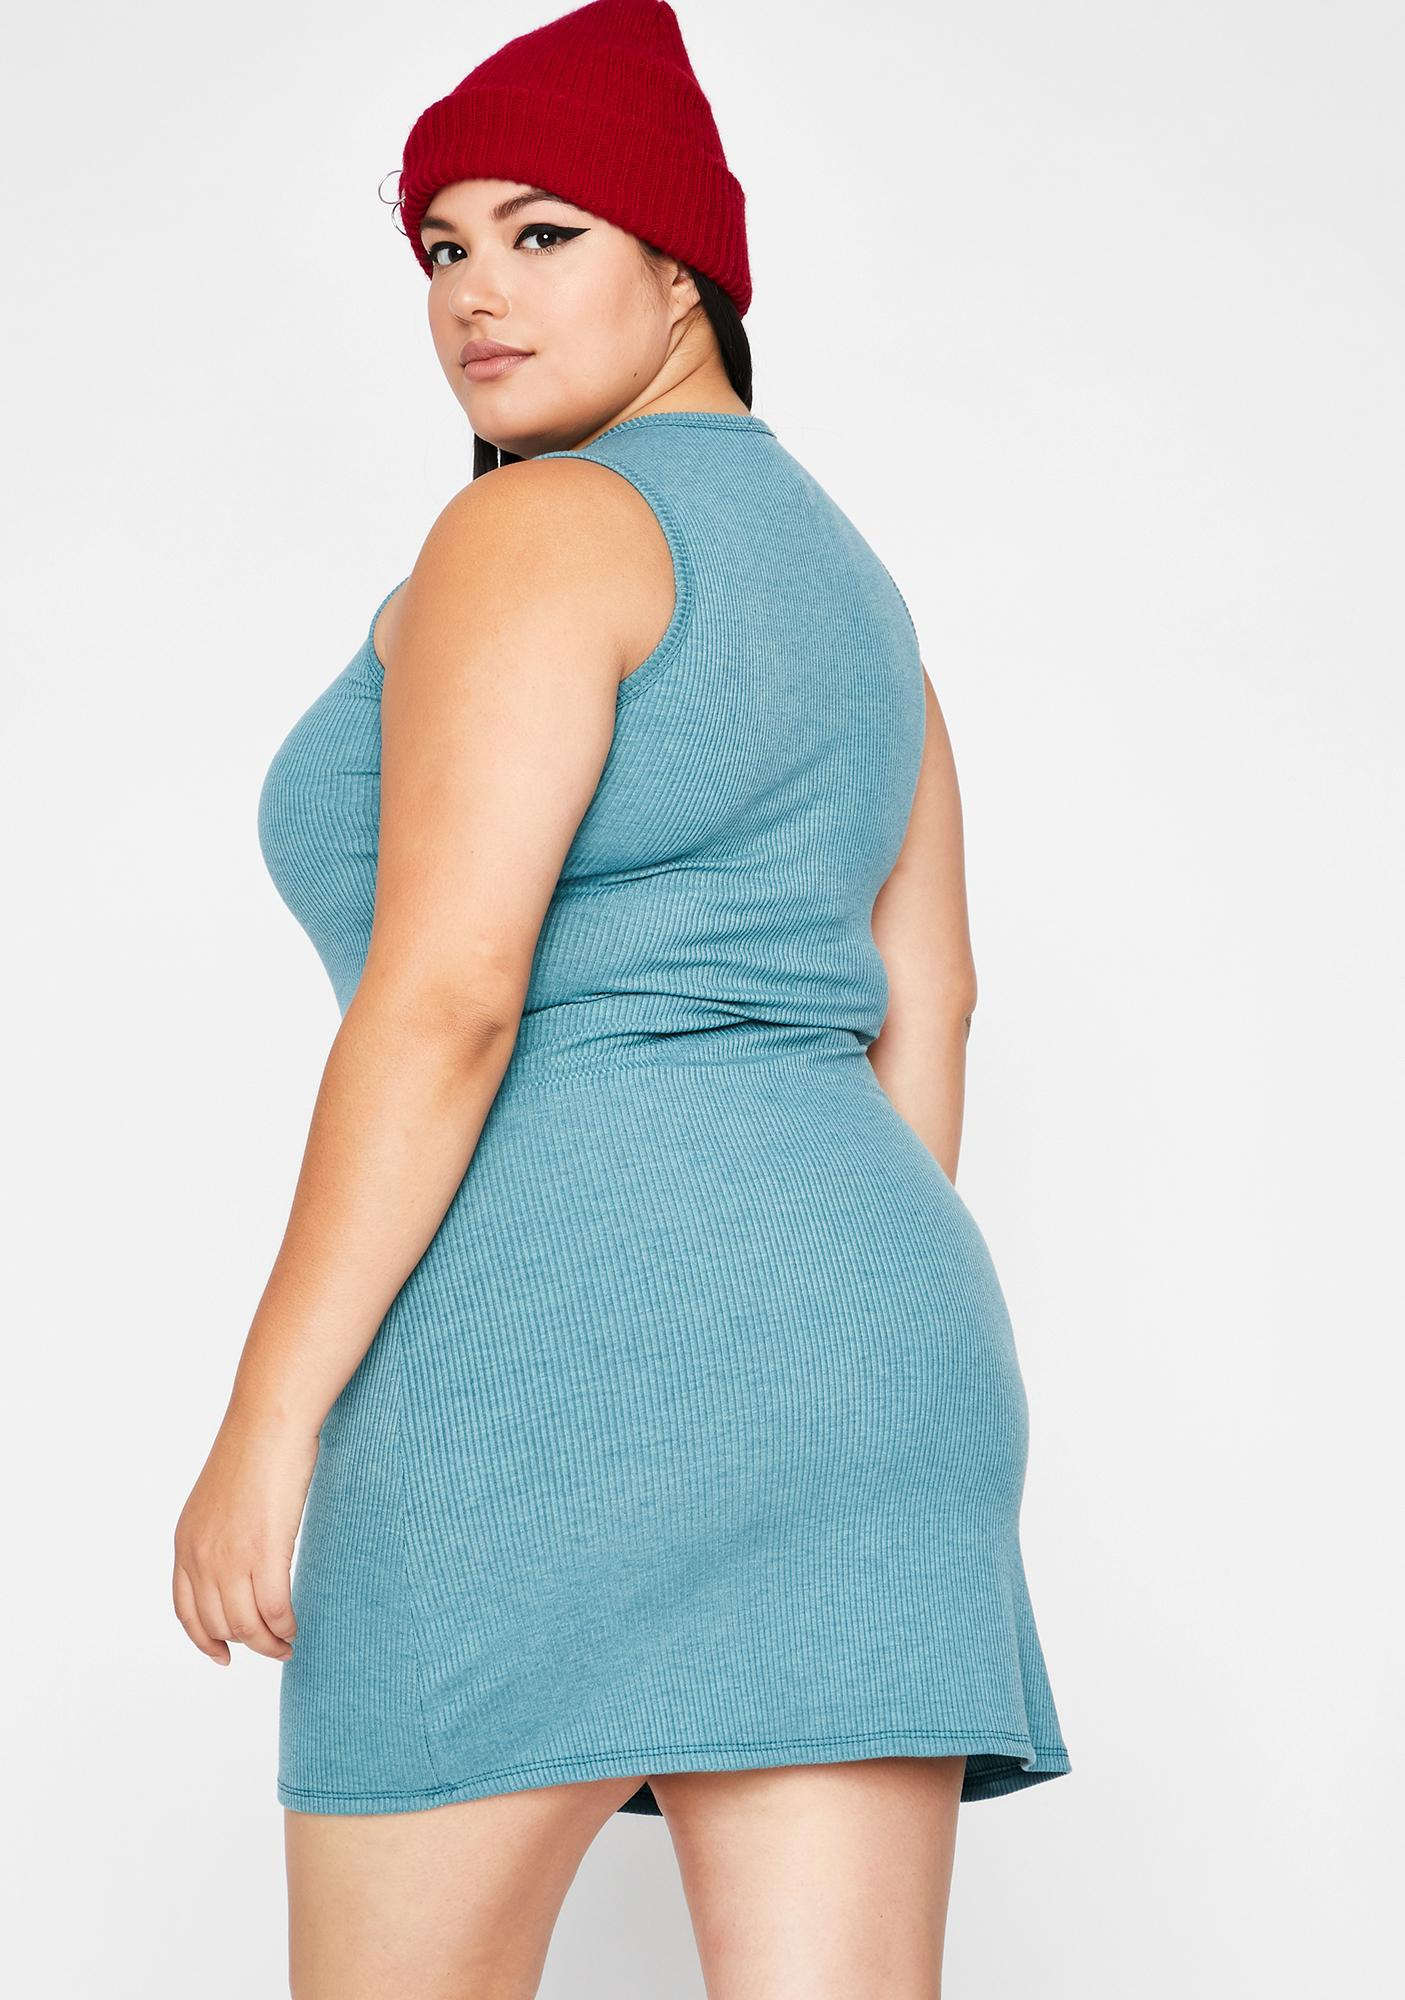 Aqua Cozy Couture Tank Dress